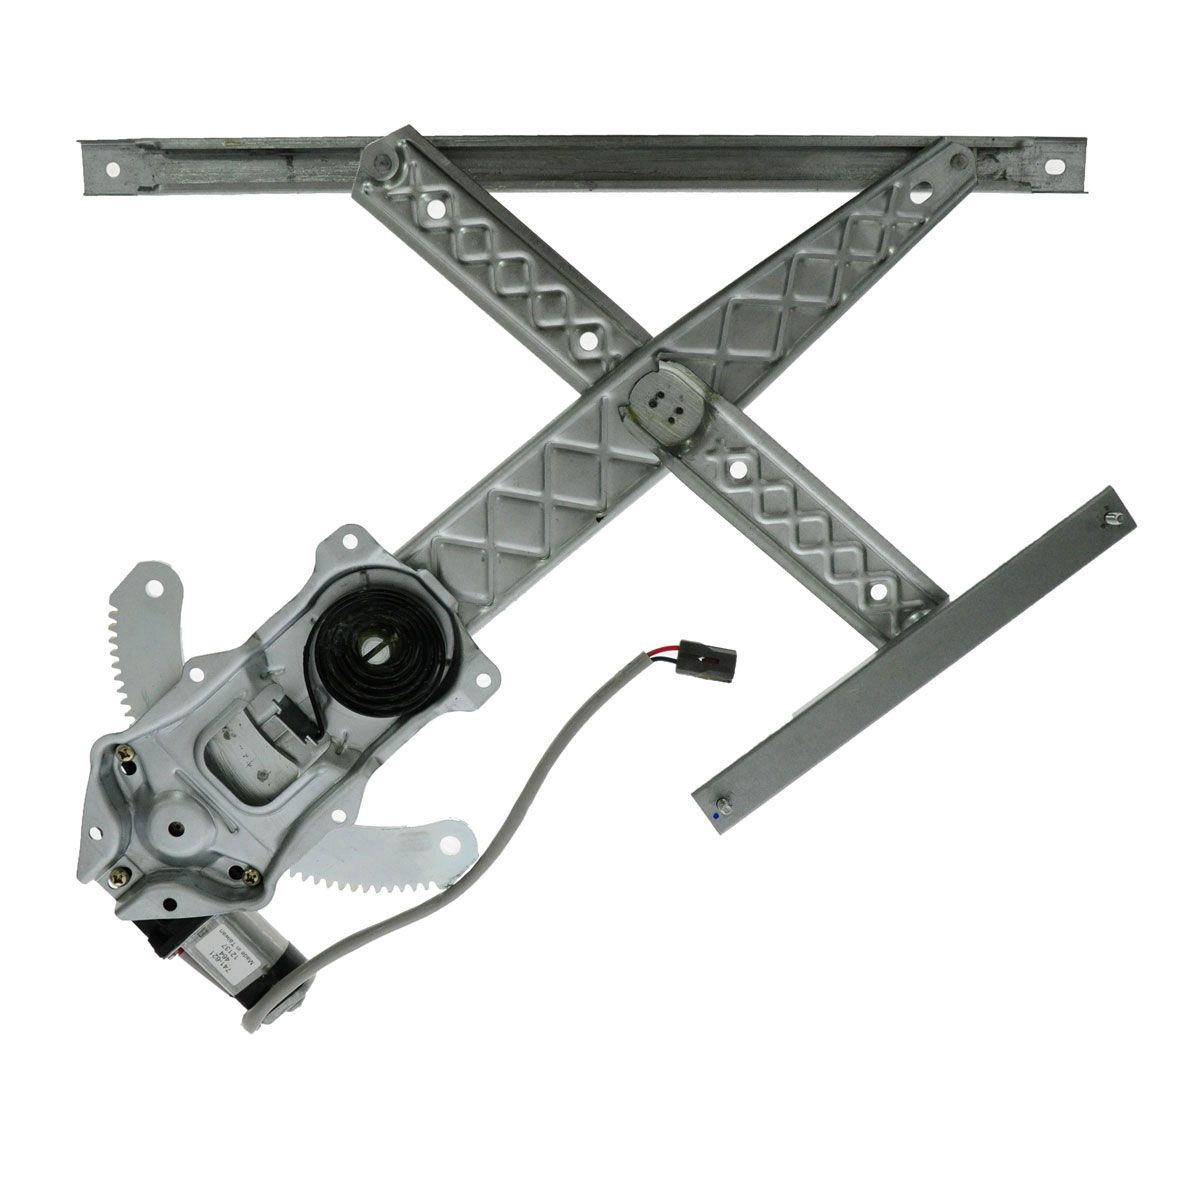 2001 ford f250 window regulator for 04 f150 window regulator replacement